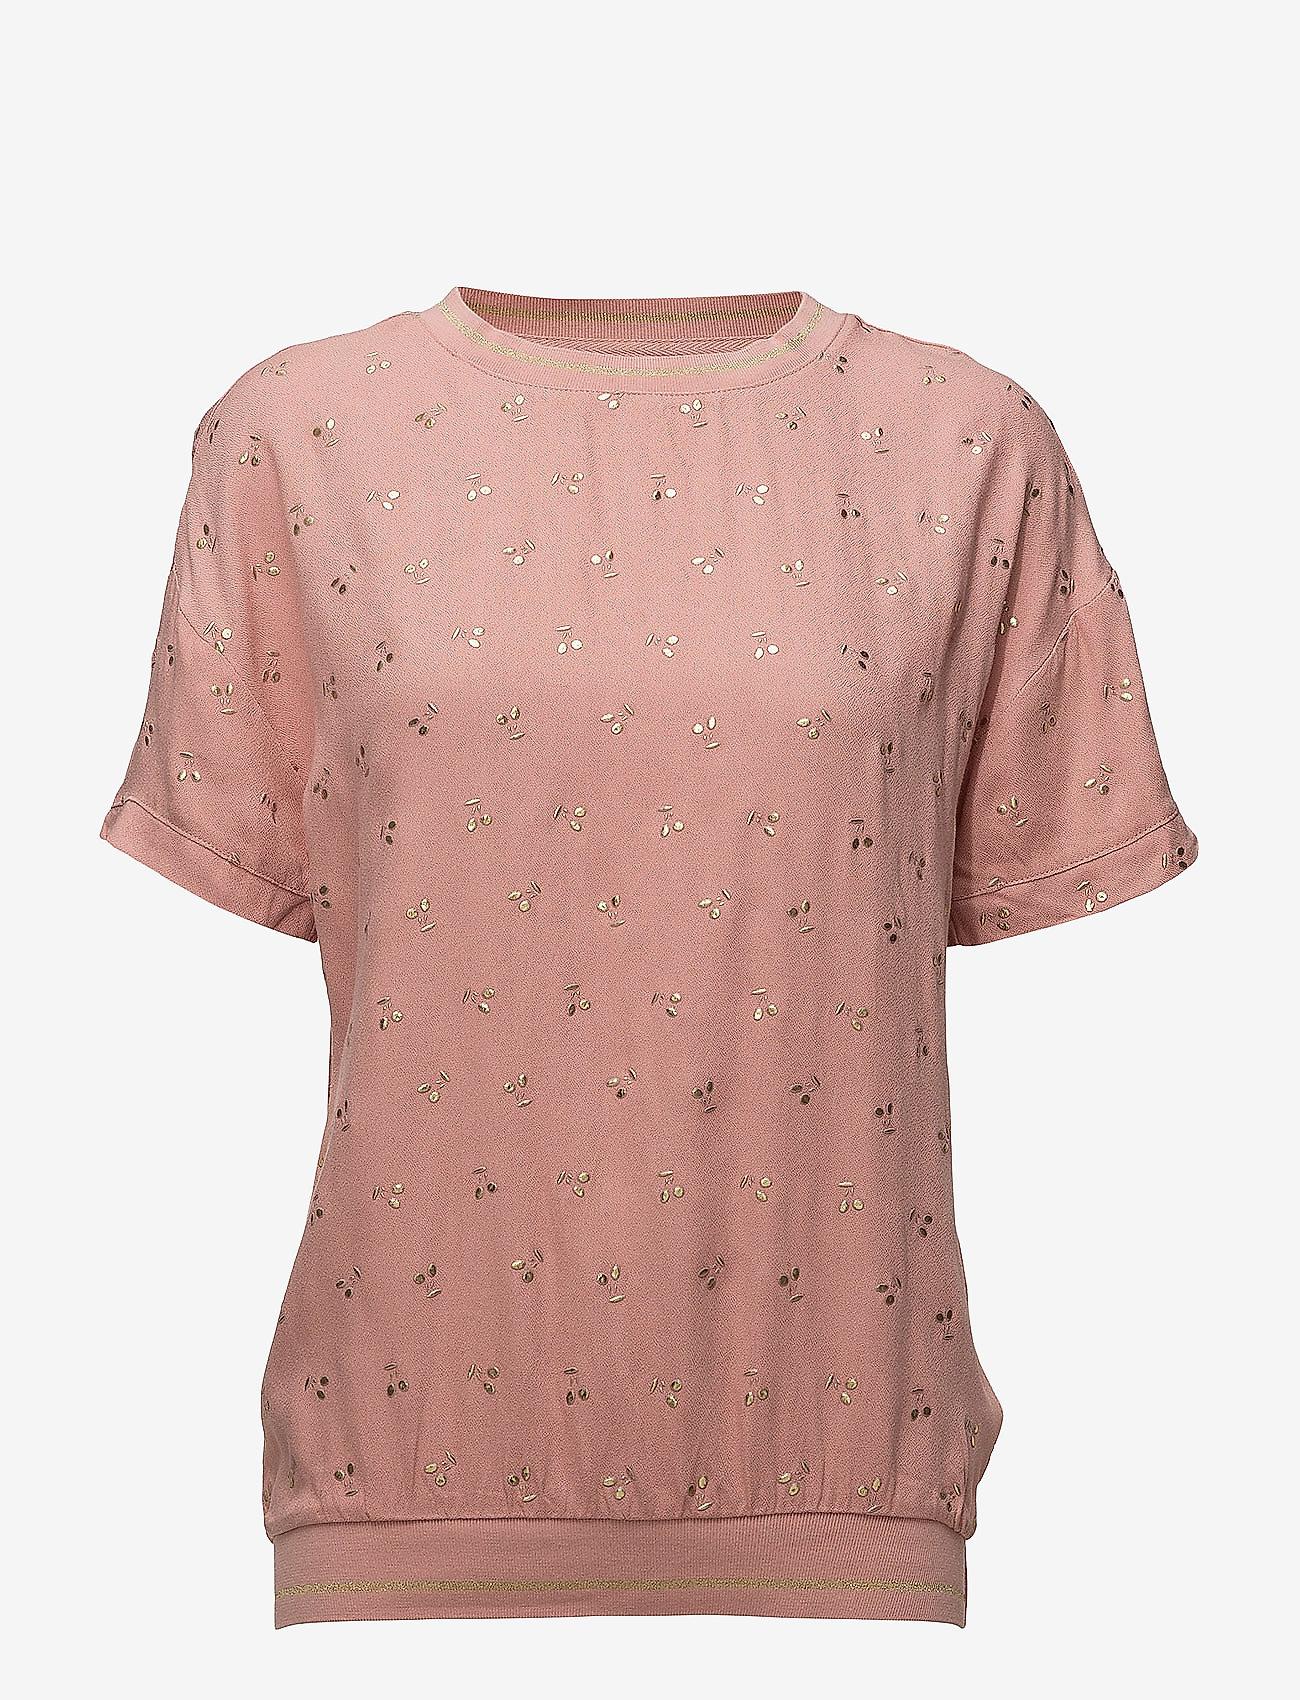 Saint Tropez - METALLIC CHERRY PRINT BLOUSE - t-shirts - b. rose